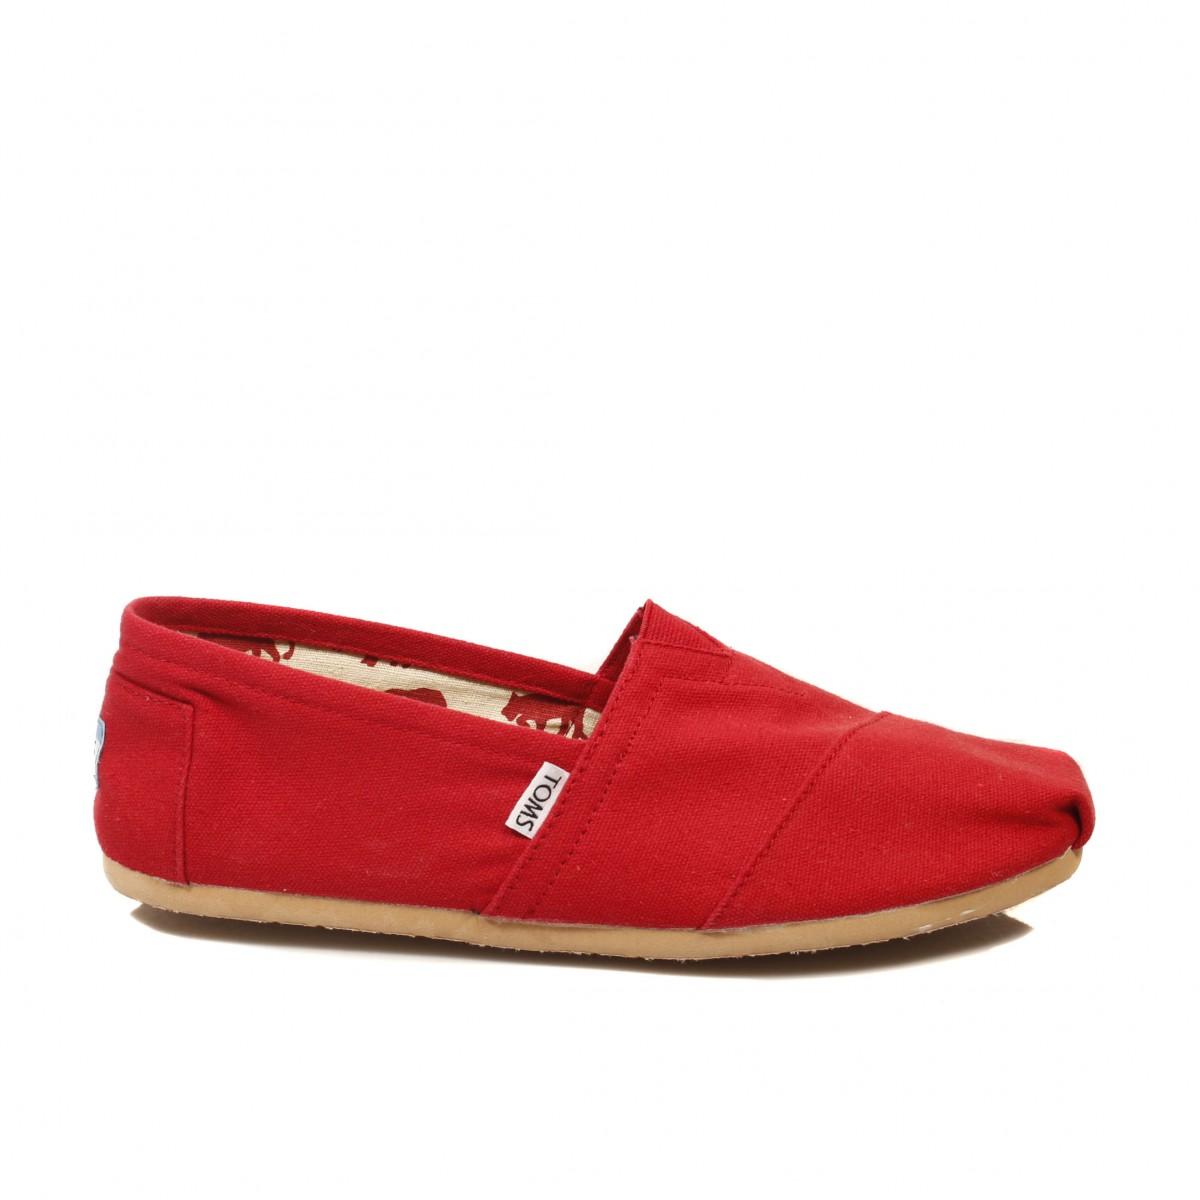 TOMS MAN RED CLASSICS CANVAS